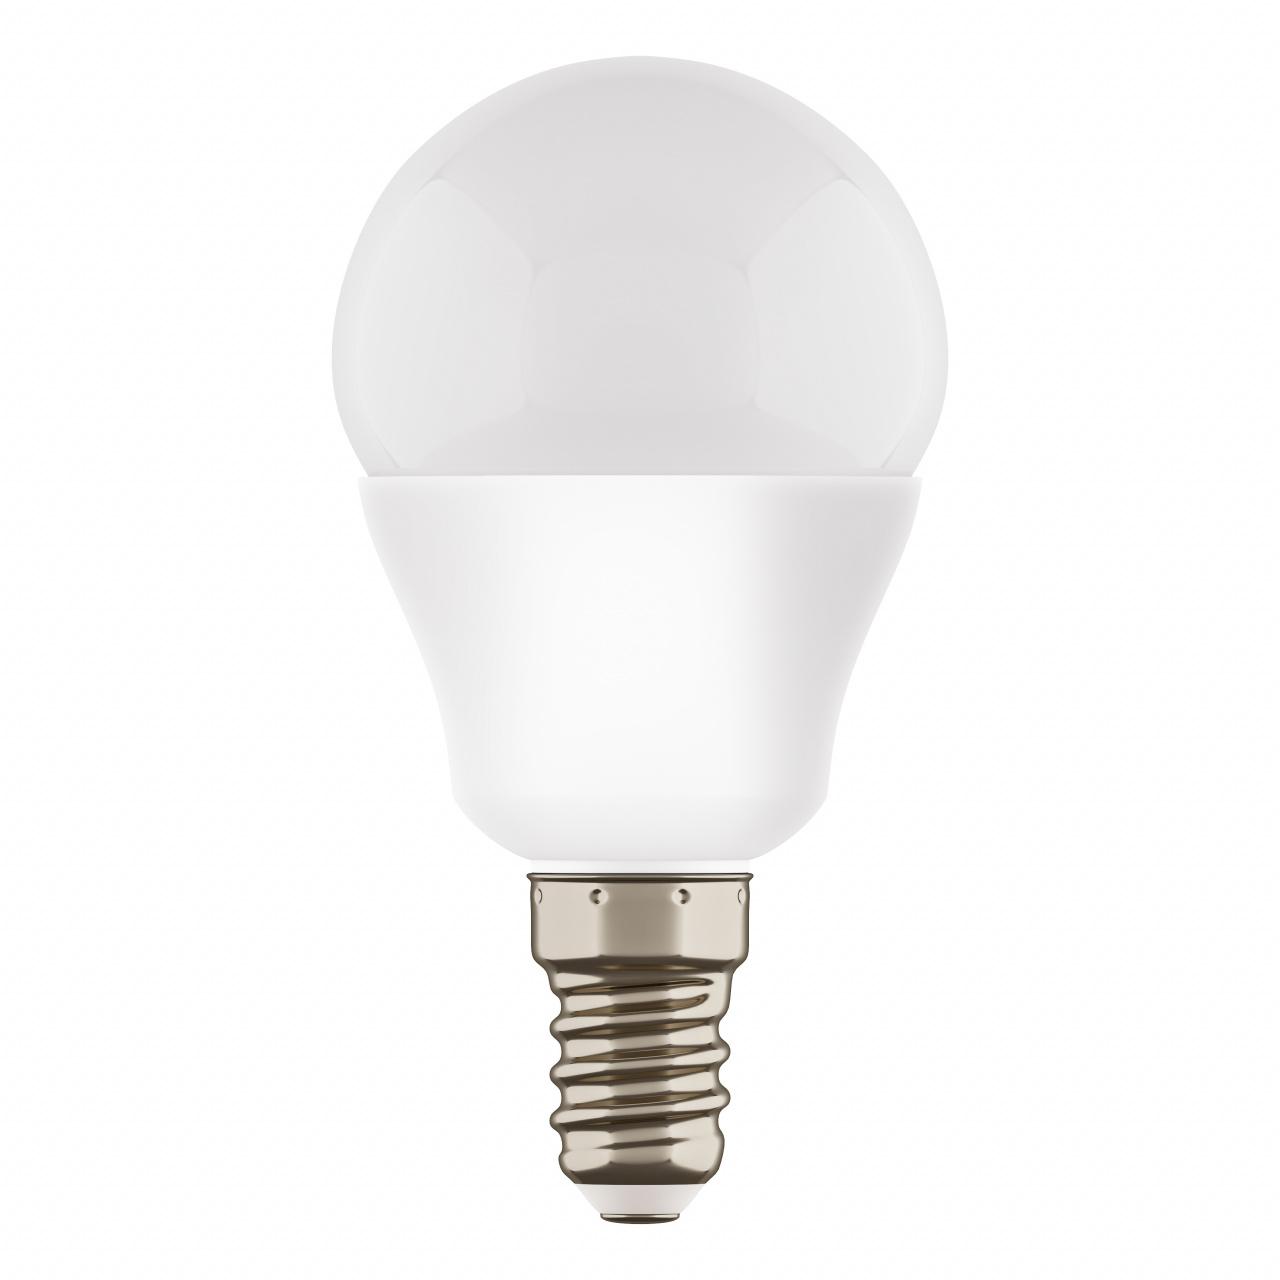 Лампа LED 220V G45 E14 7W=65W 350LM 180G FR 4000K 20000H Lightstar 940804